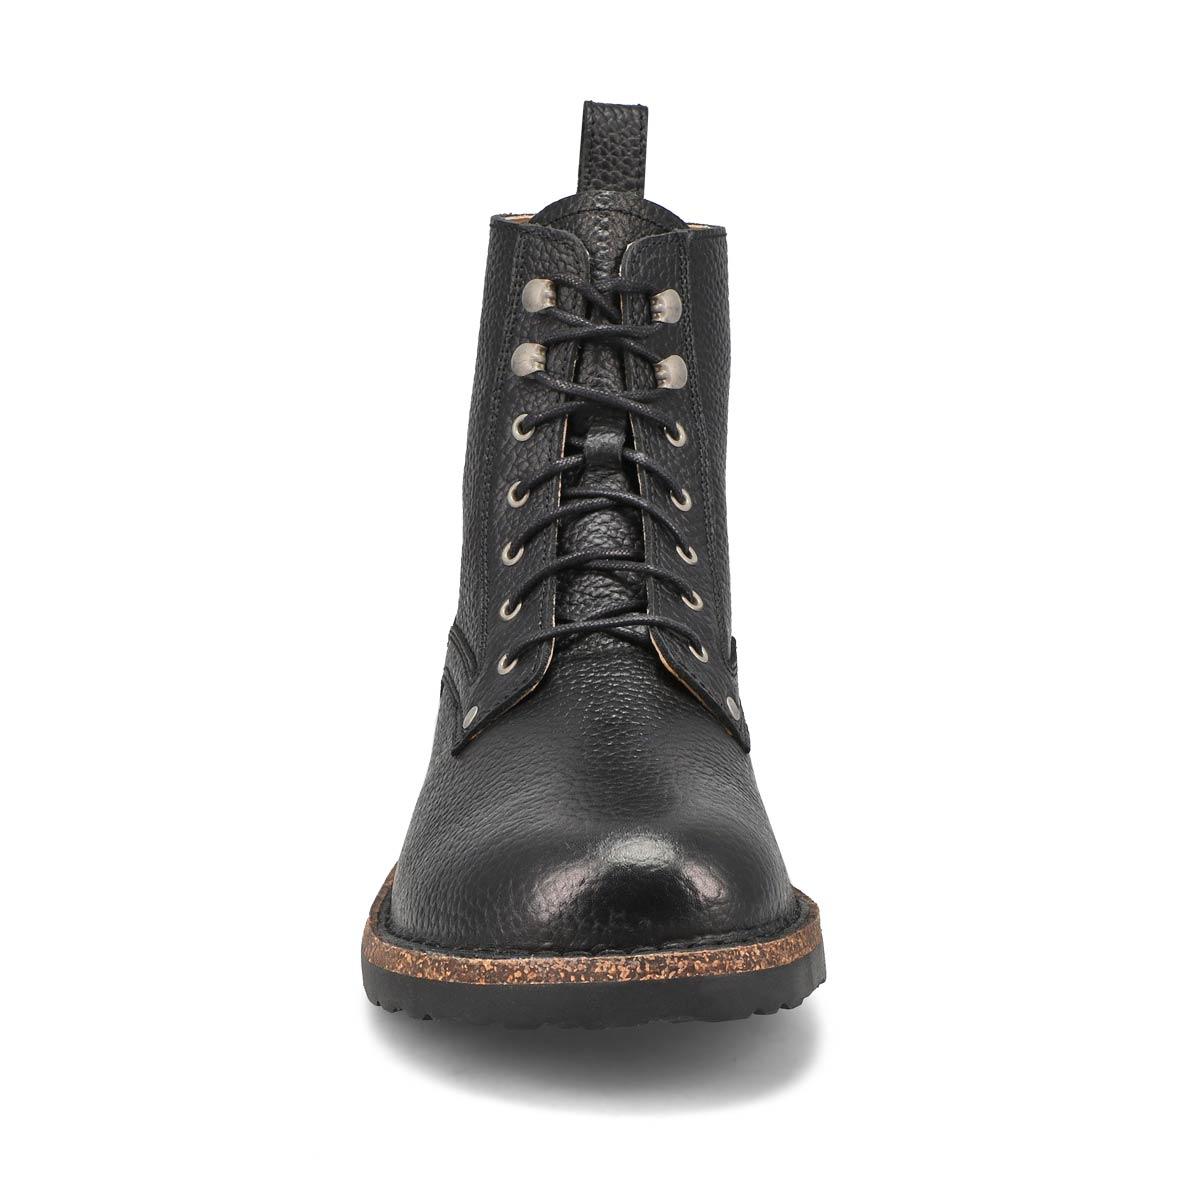 Men's Bryson Combat Boot - Black